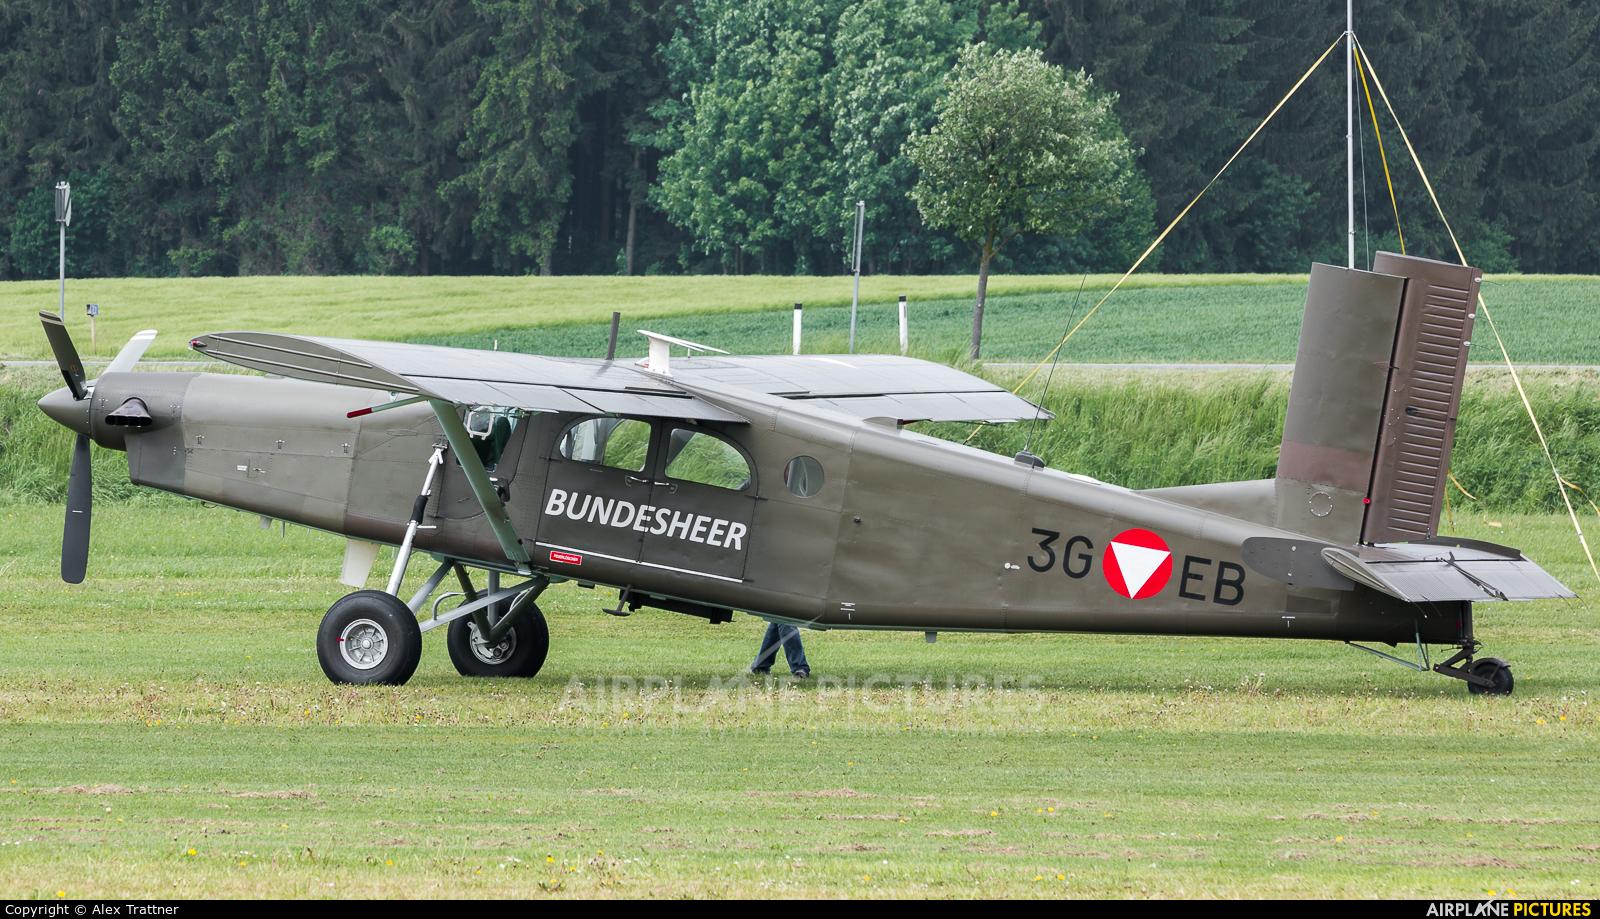 Austria - Air Force 3G-EB aircraft at Völtendorf